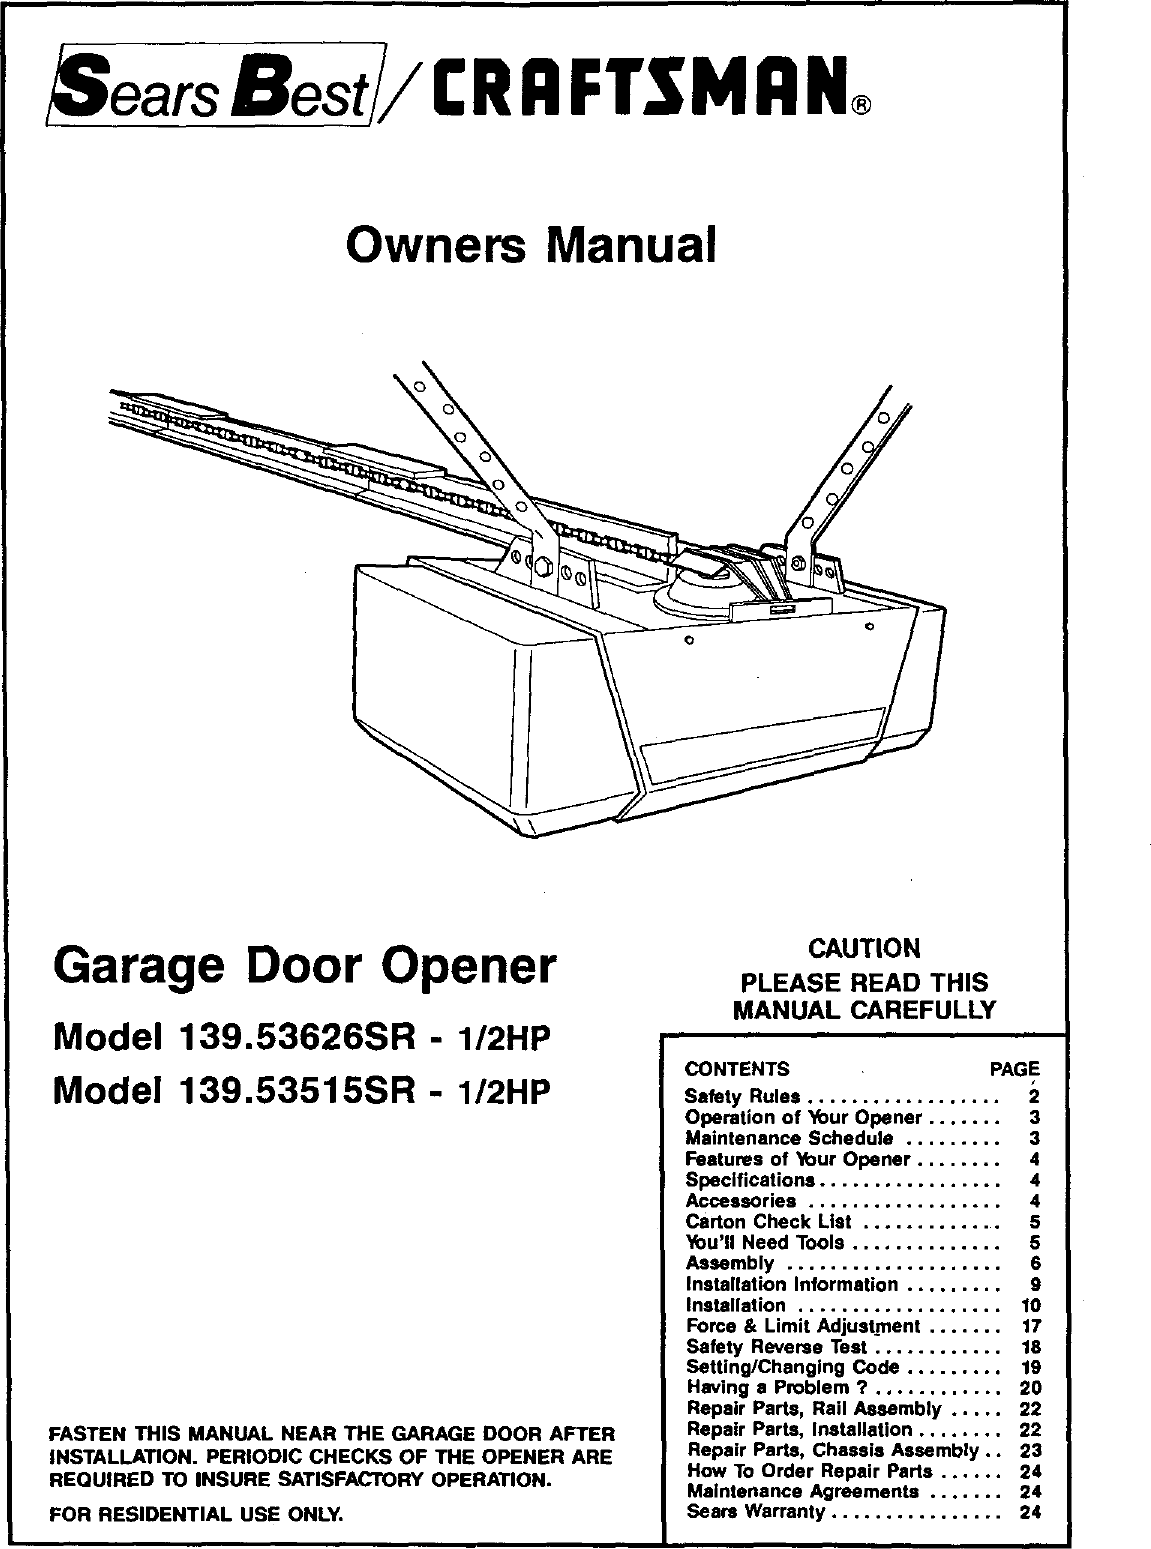 Craftsman 139 53626sr I 2hp Users Manual